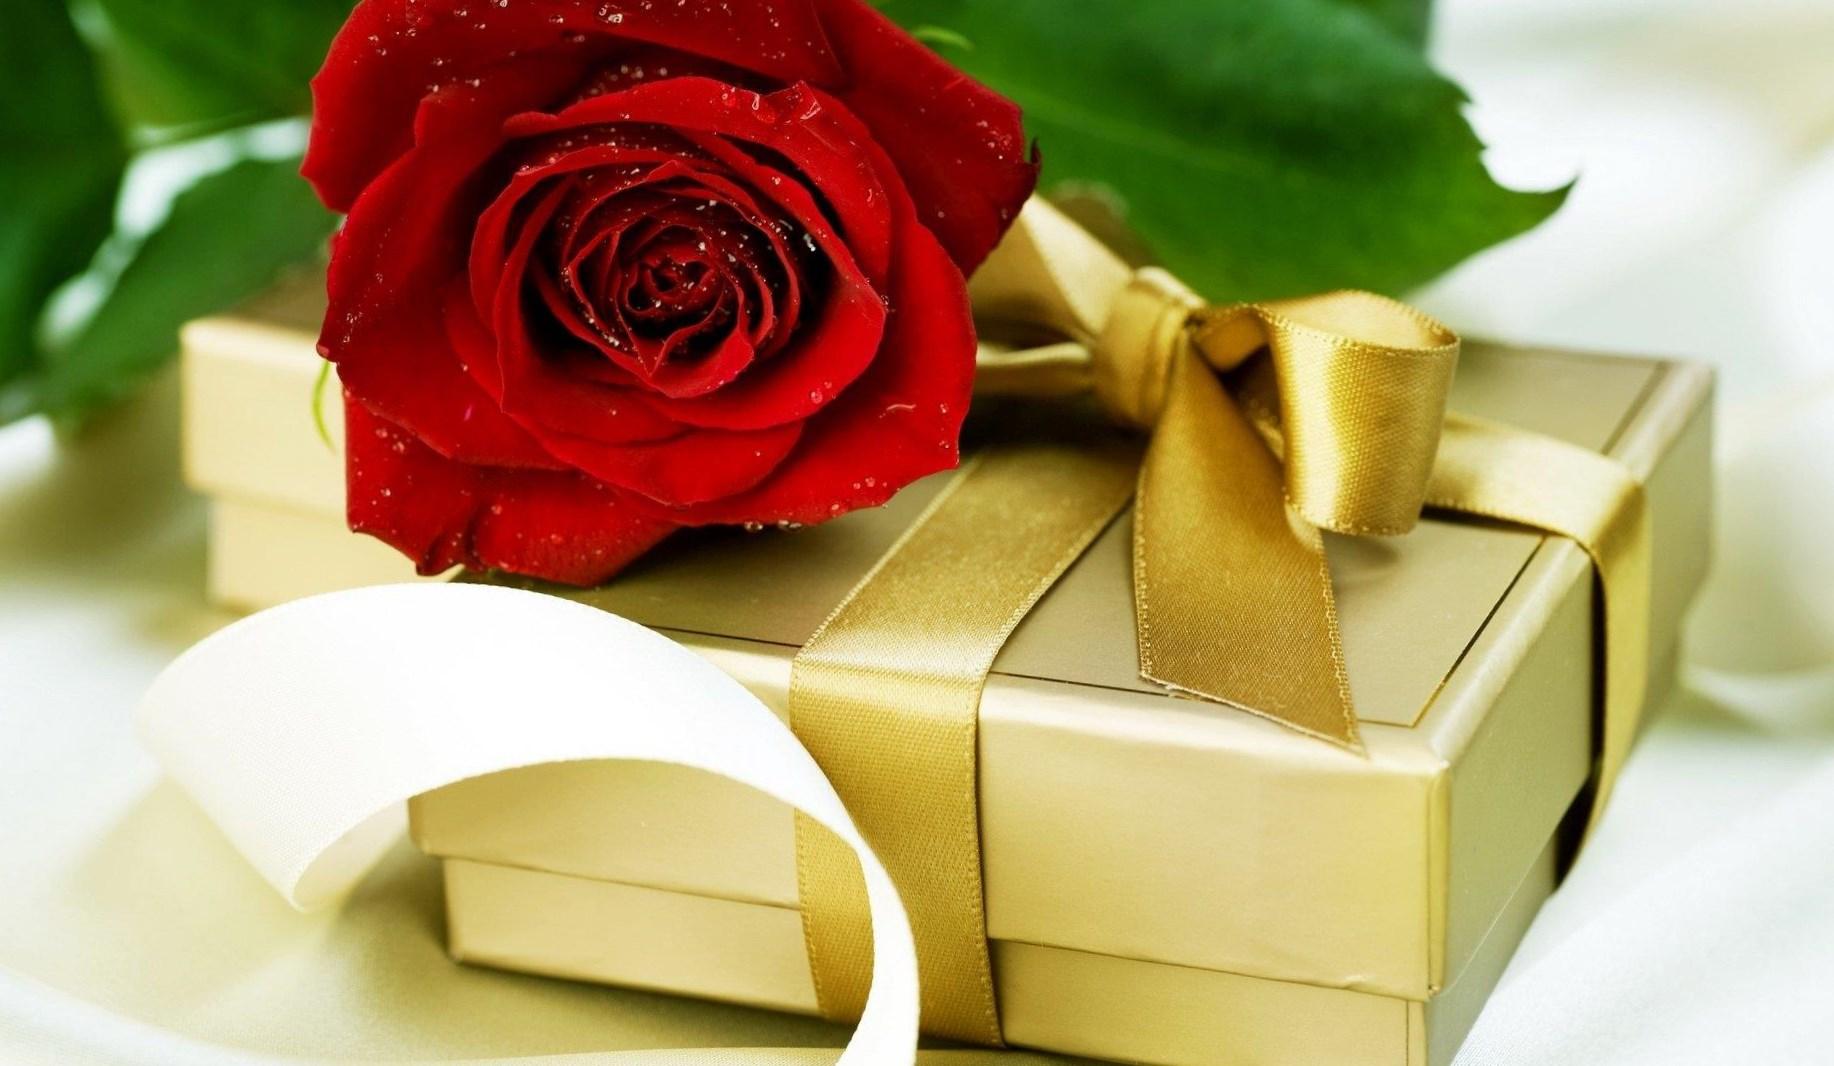 коробка конфет и роза